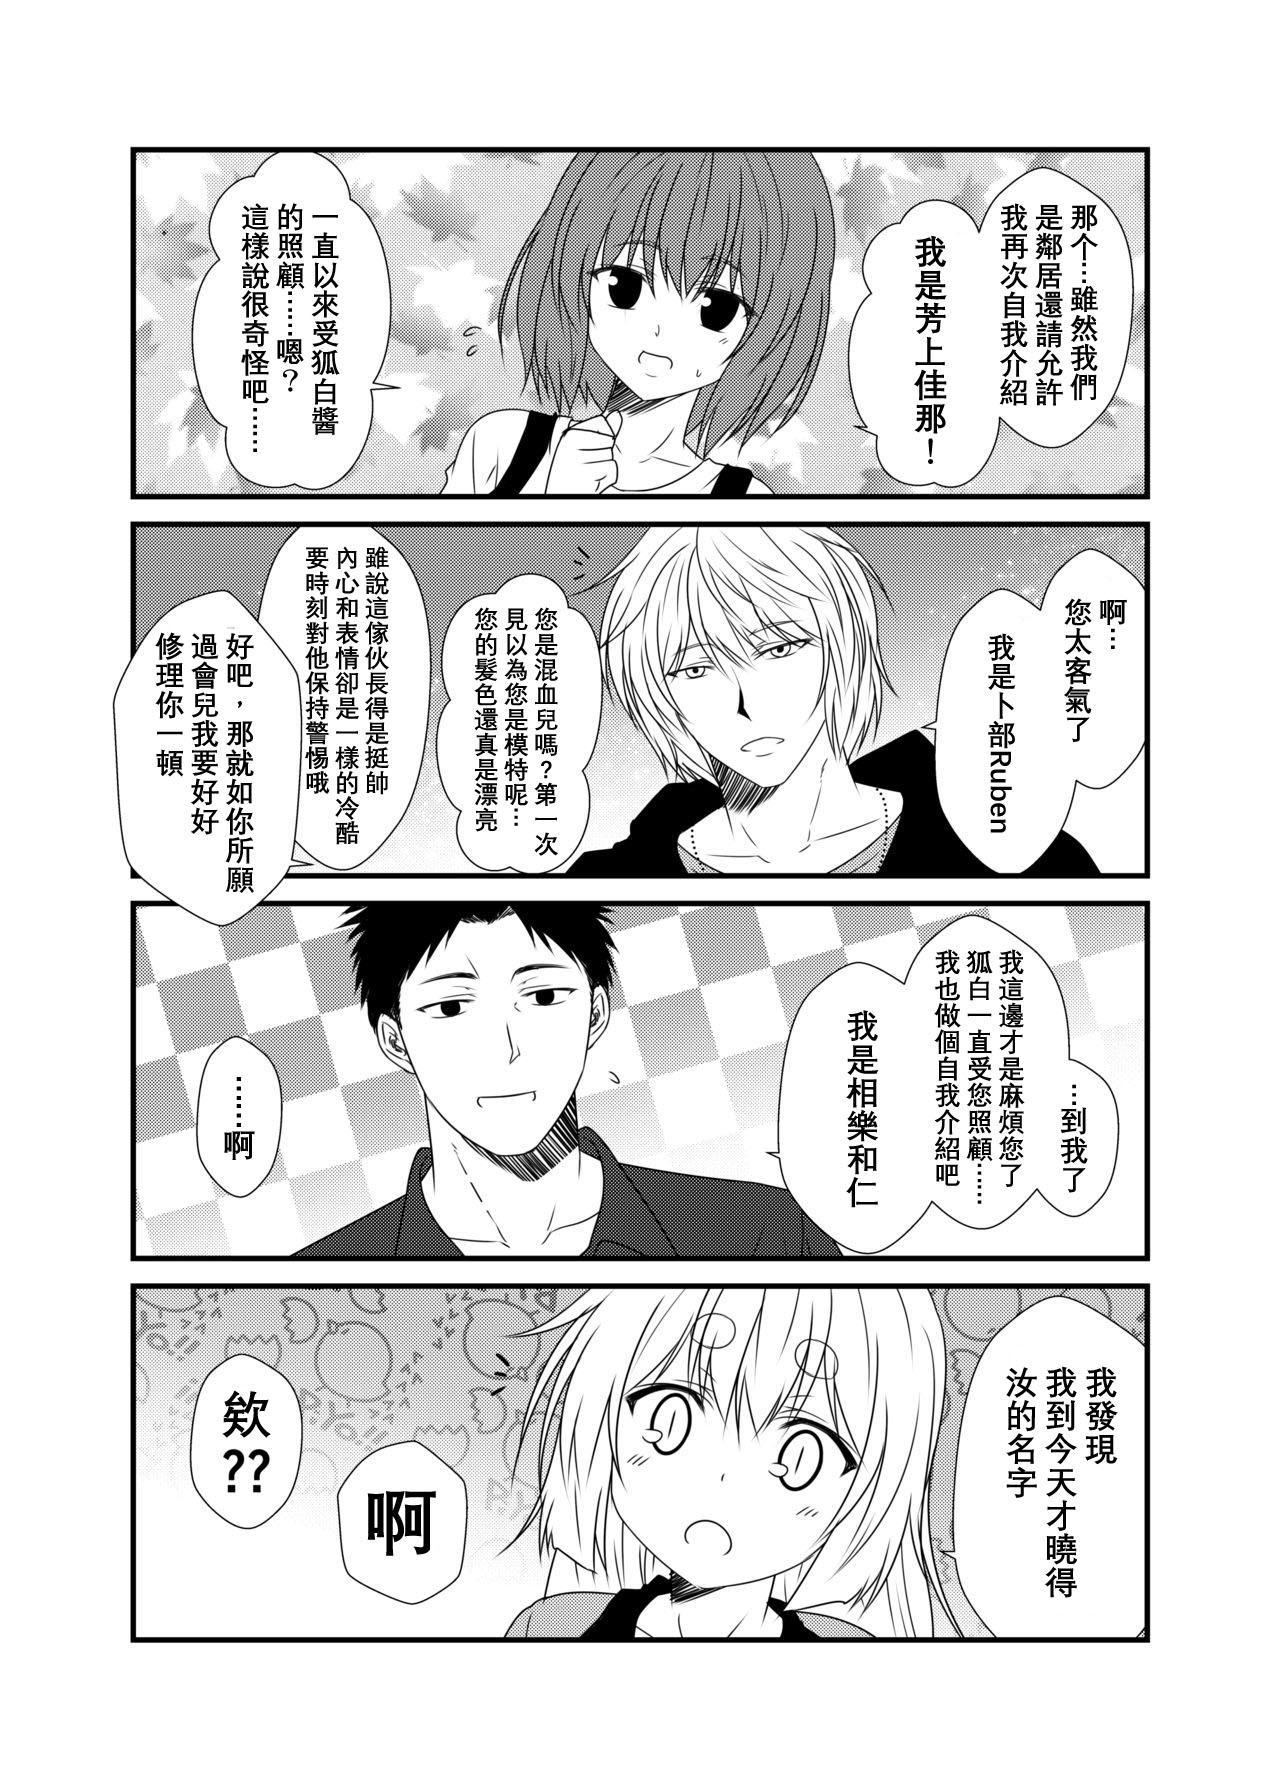 Kohaku Biyori Vol. 5 14